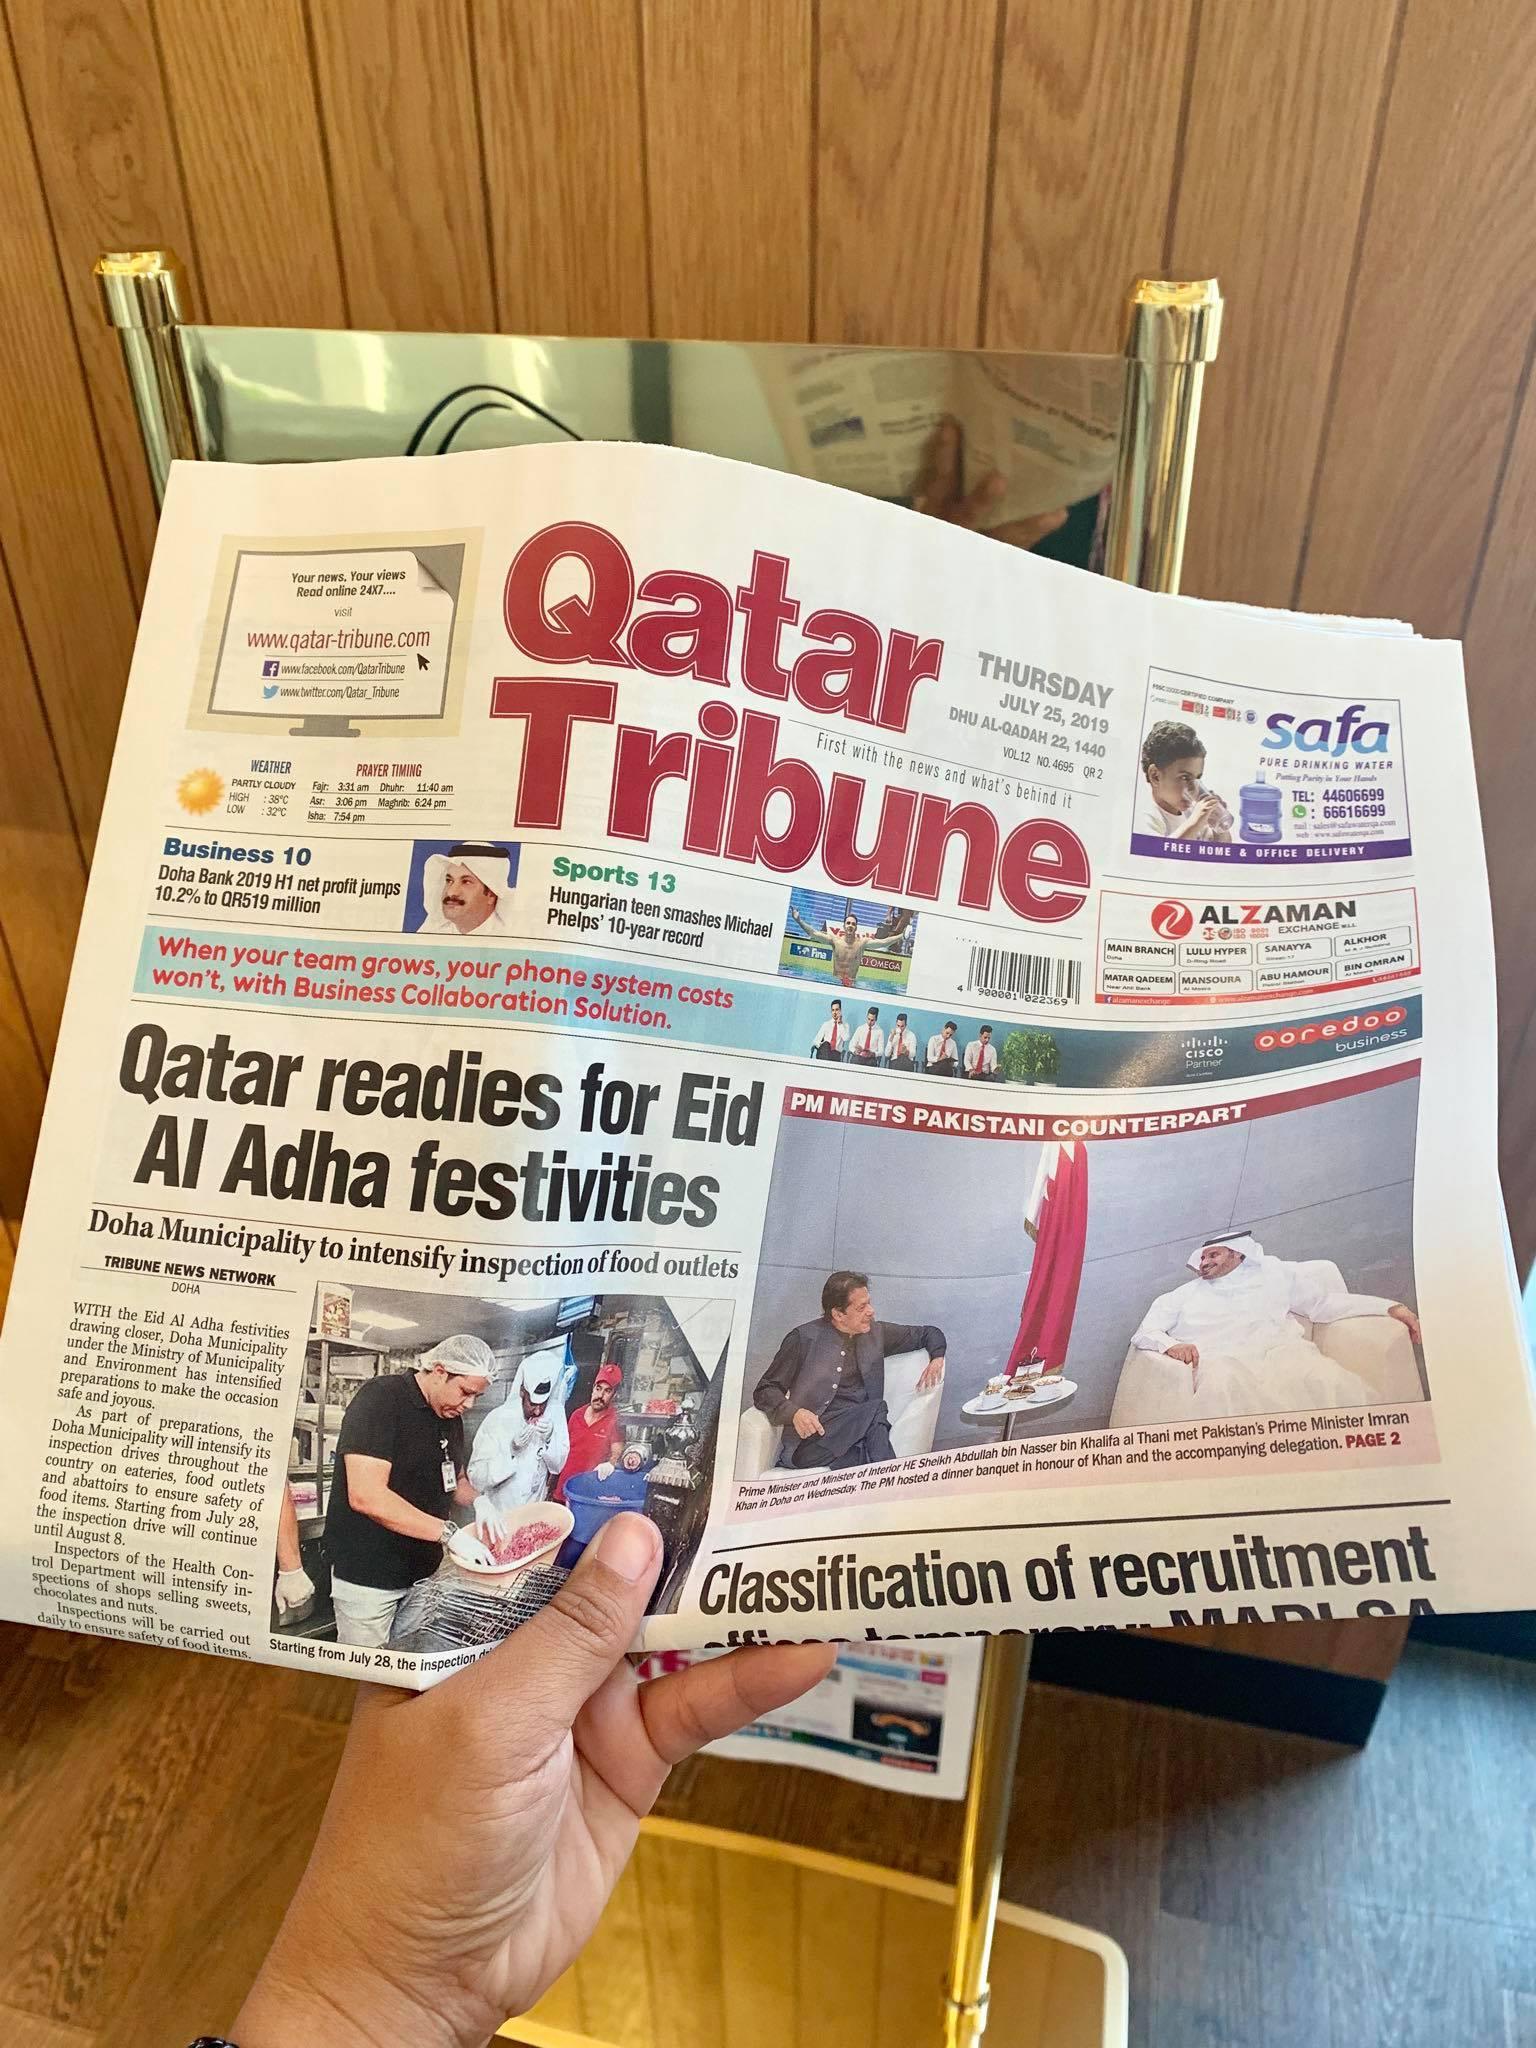 Kach Solo Travels in 2019 I did a 20-hour layover in Doha, QATAR6.jpg